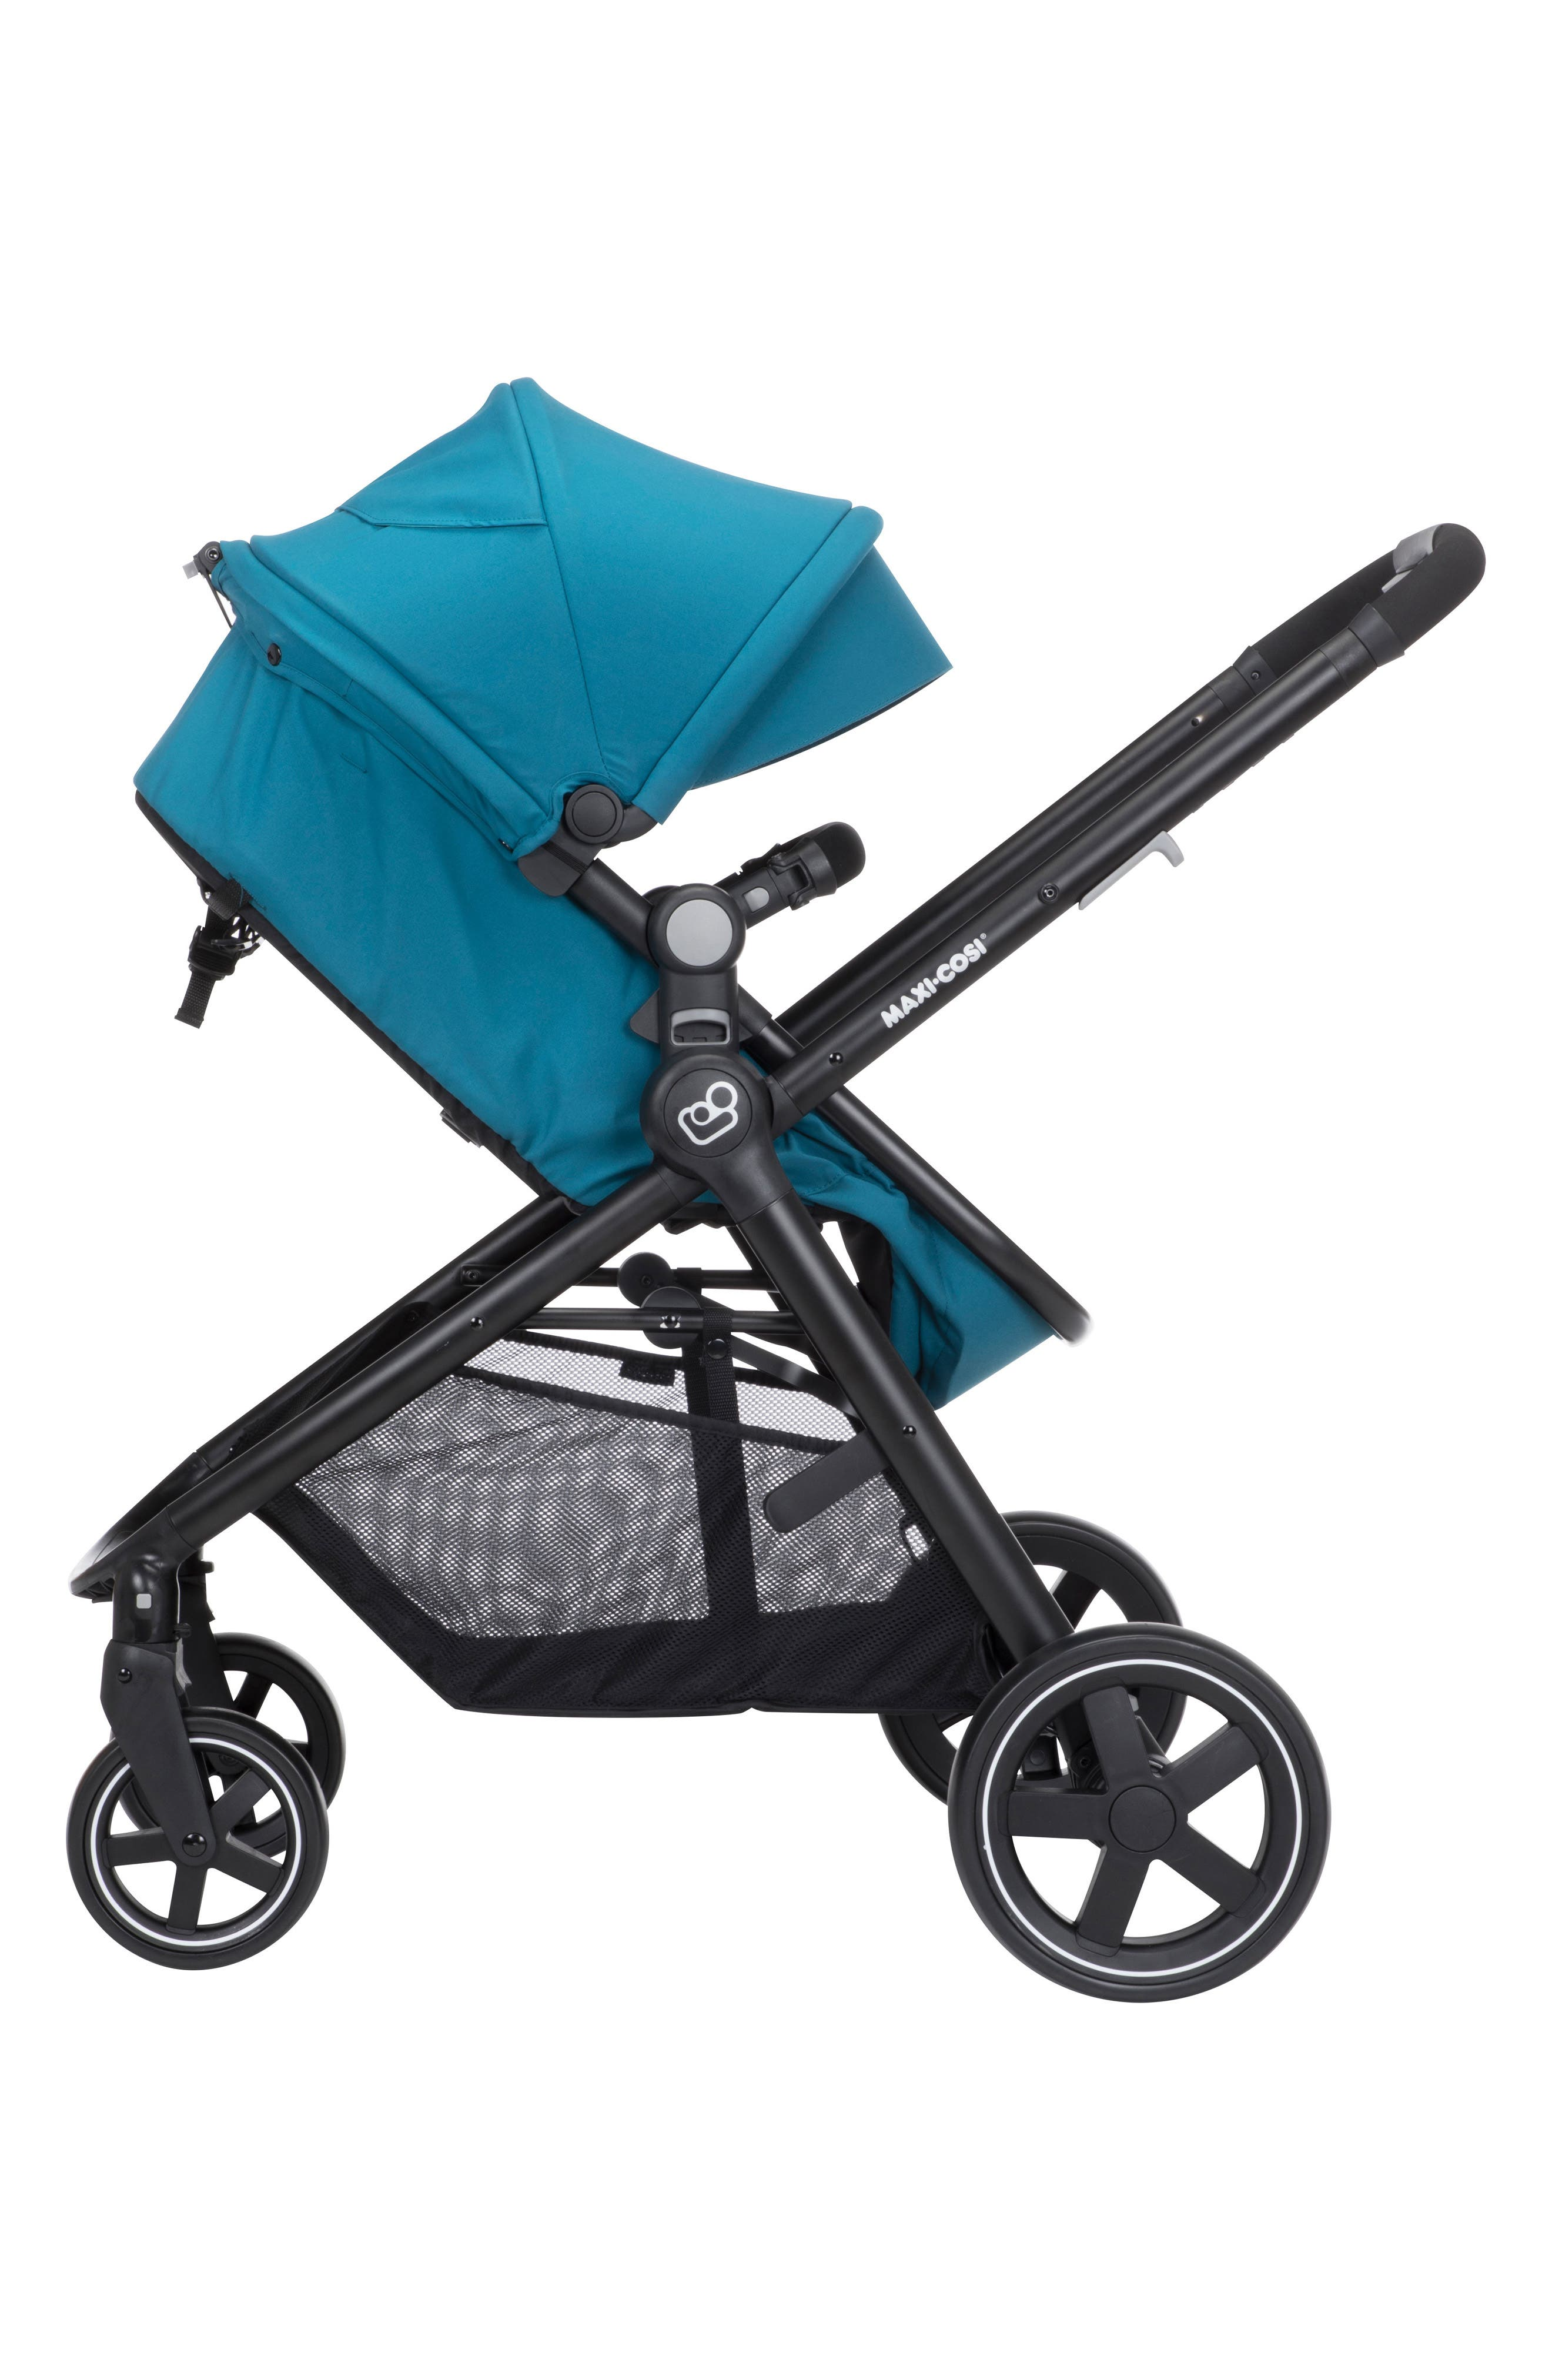 5-1 Mico 30 Infant Car Seat & Zelia Stroller Modular Travel System,                             Alternate thumbnail 4, color,                             Emerald Tide